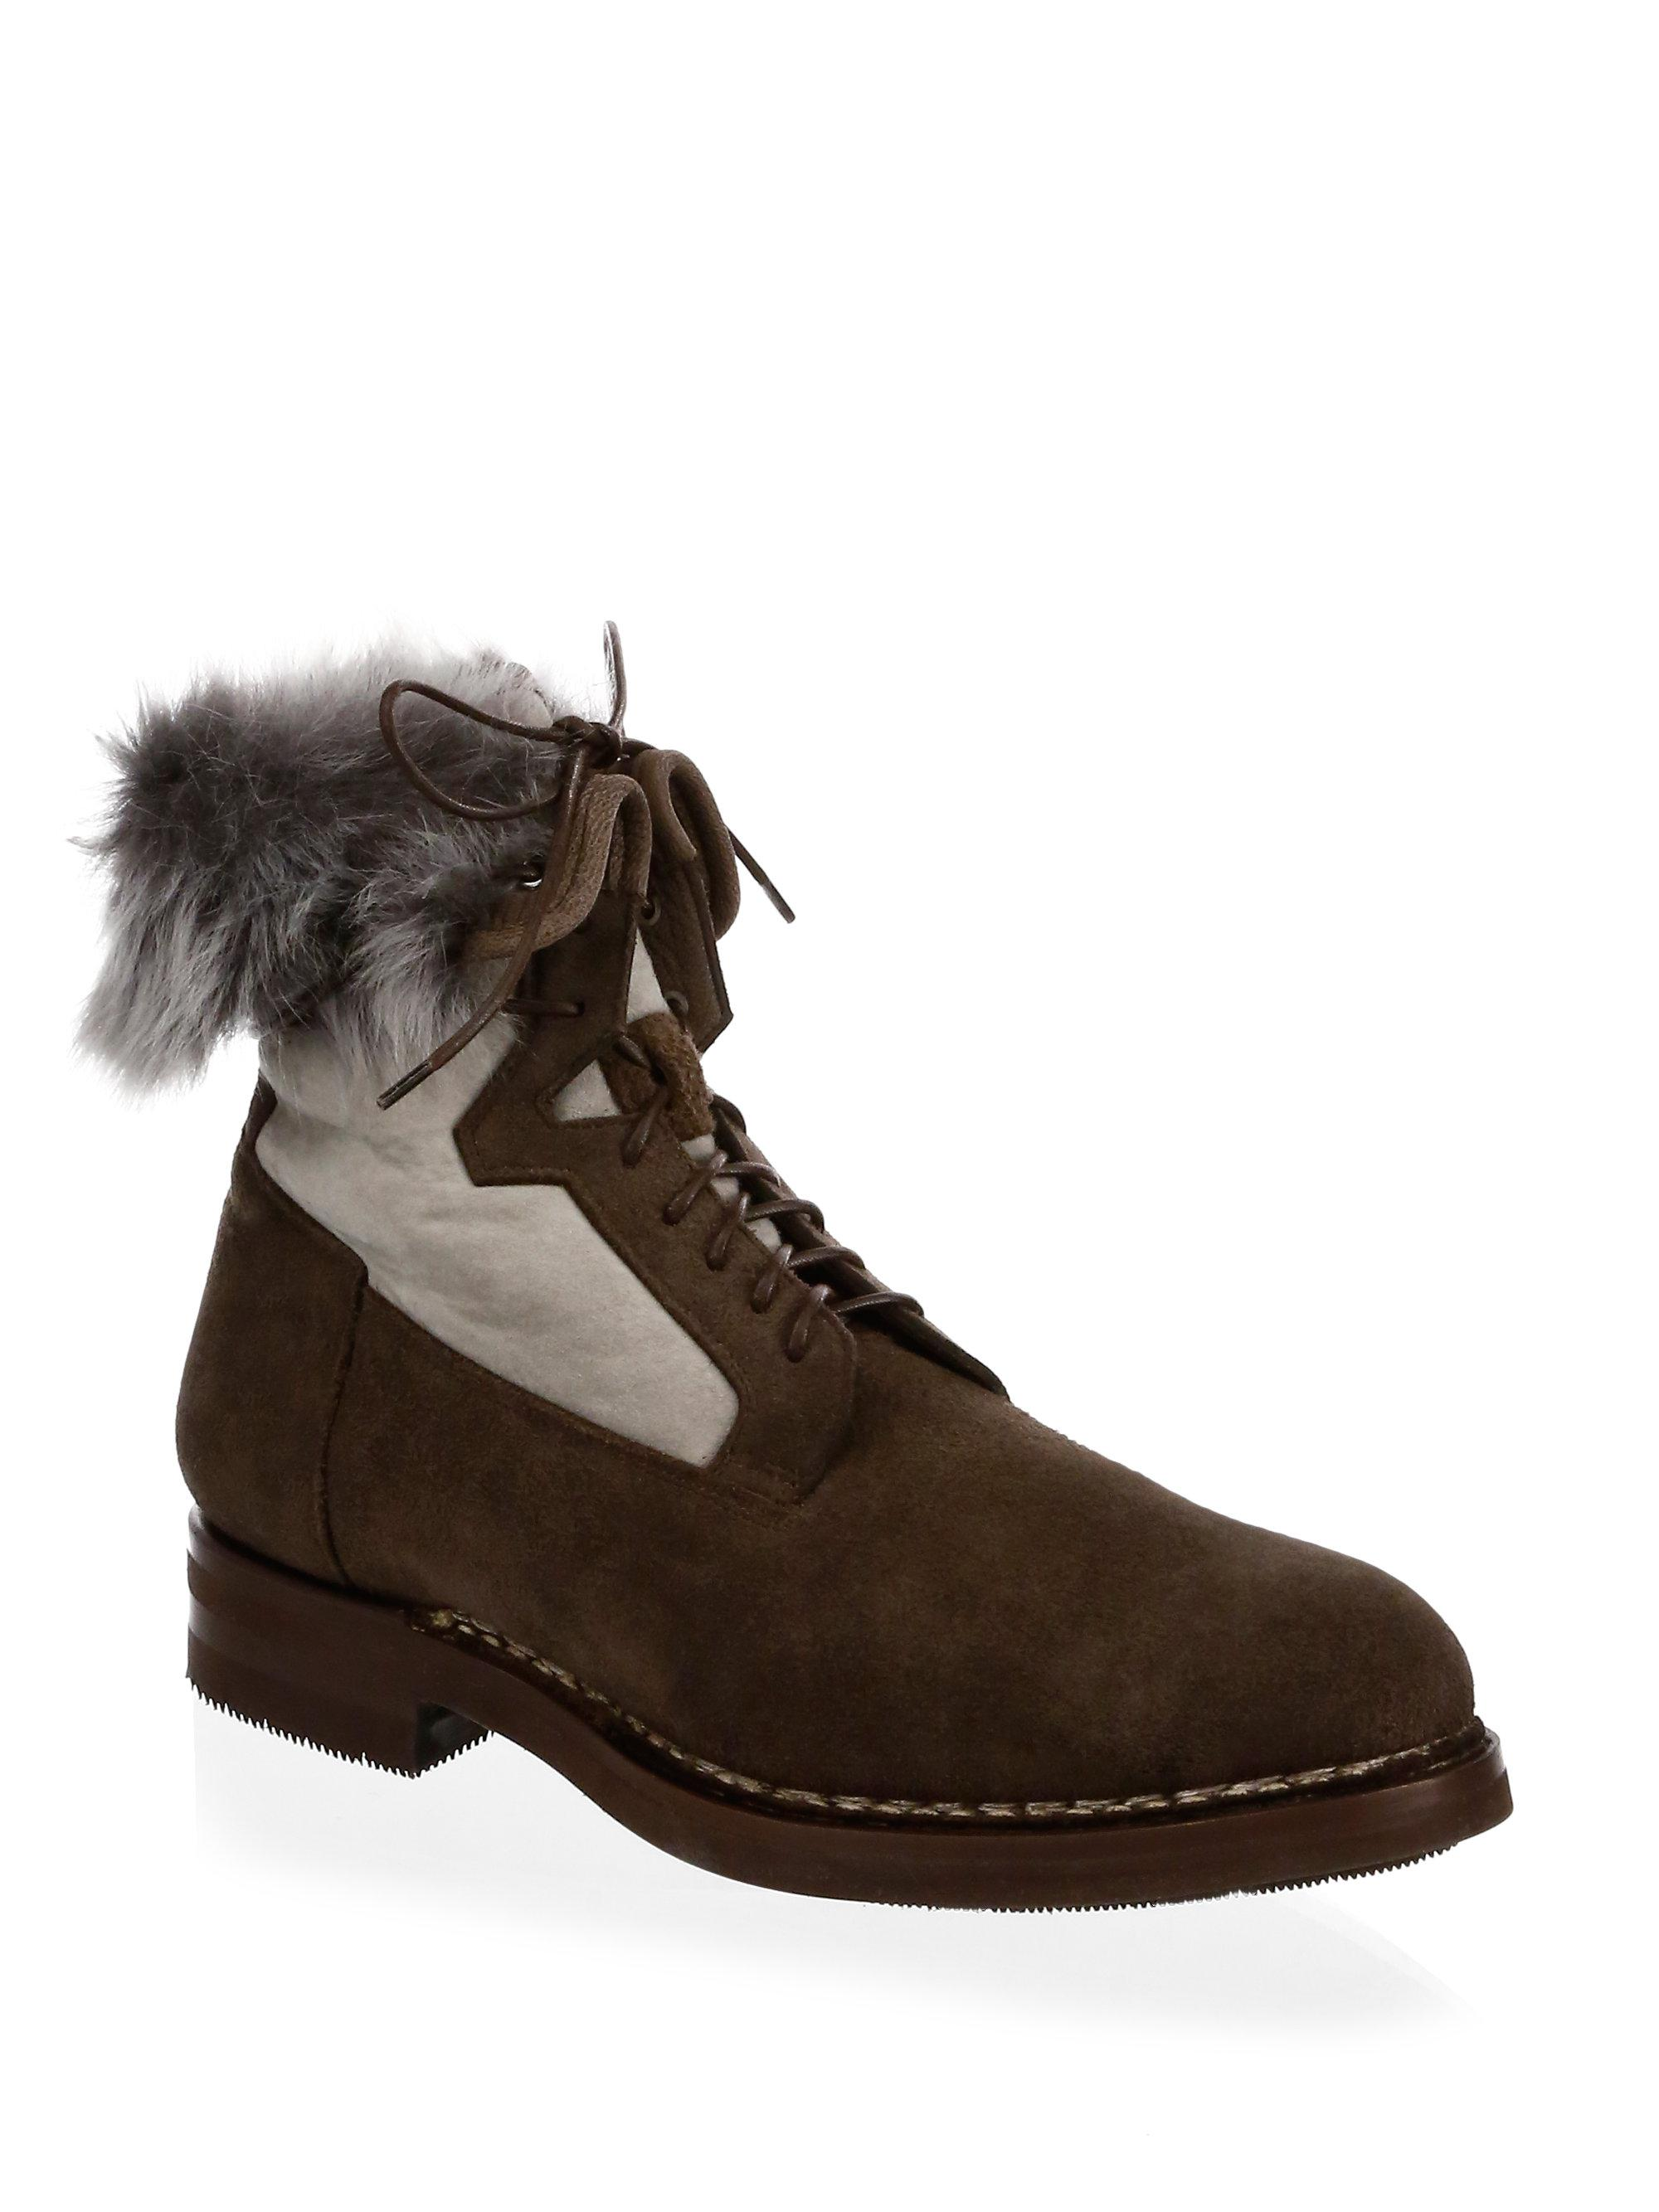 santoni Shearling-Lined Suede Ankle Boots KtZJOO3